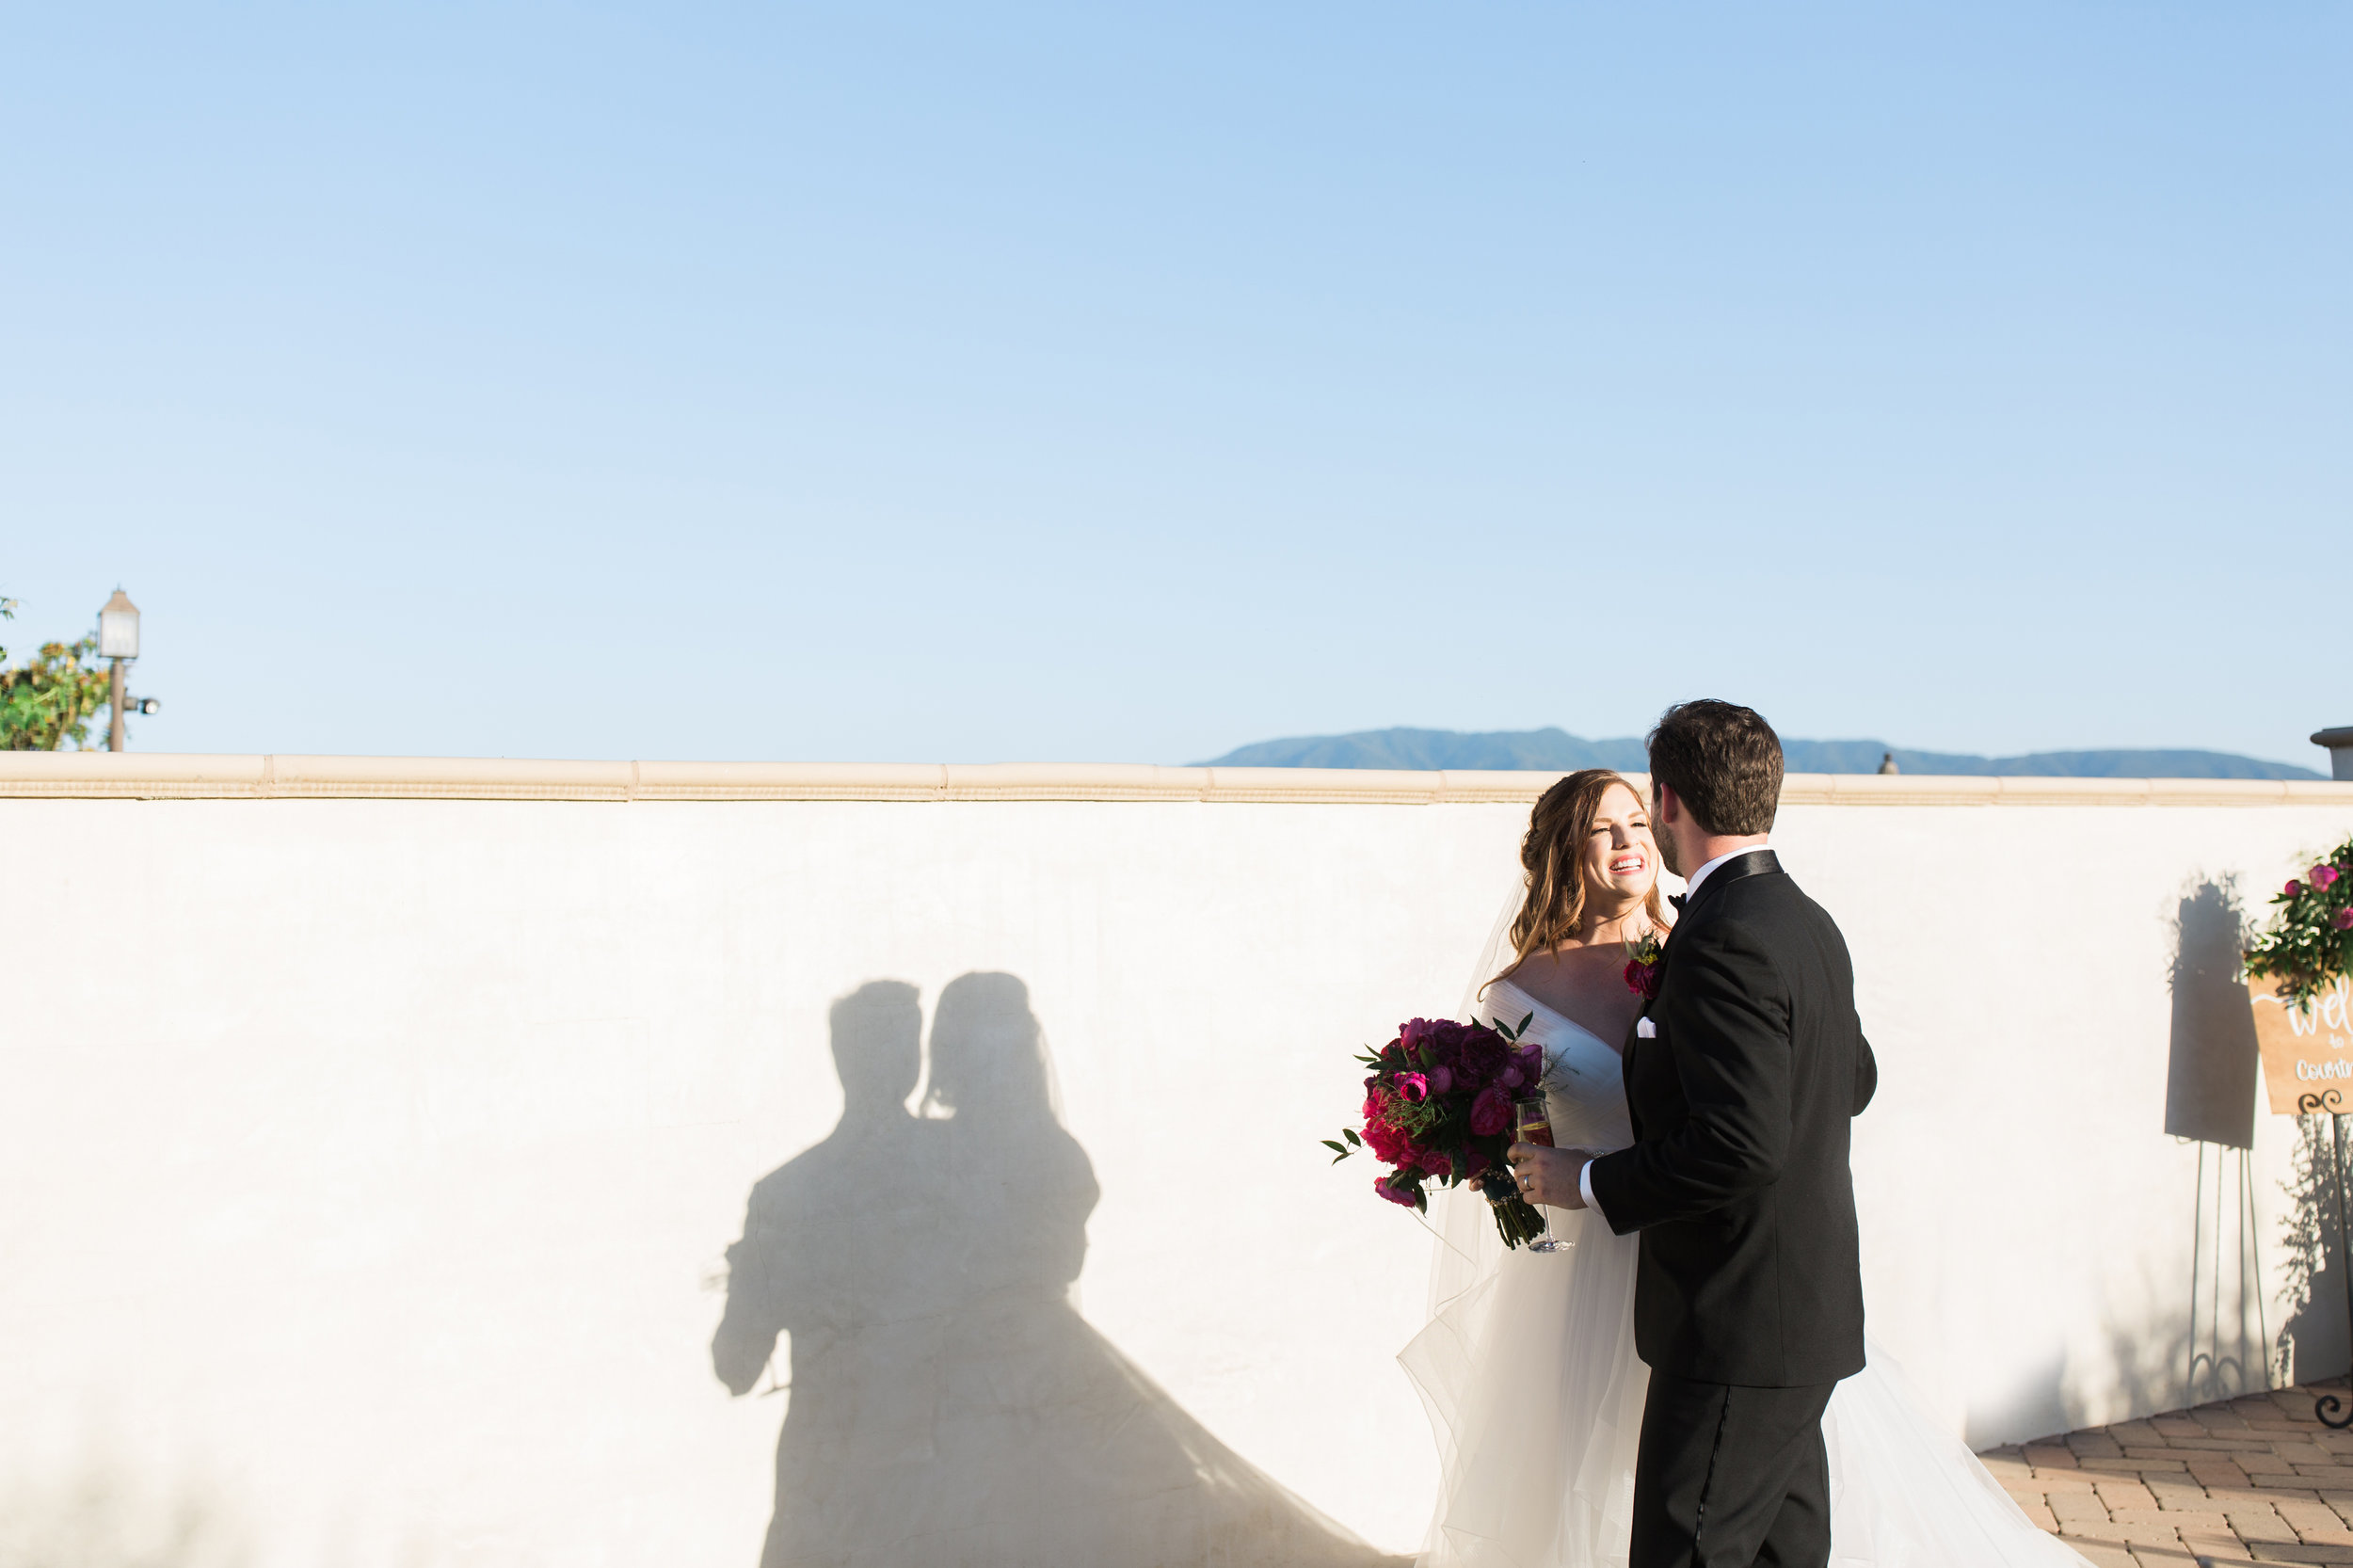 Leoness Cellars Winery Wedding Photographer Leah Vis  (3).jpg